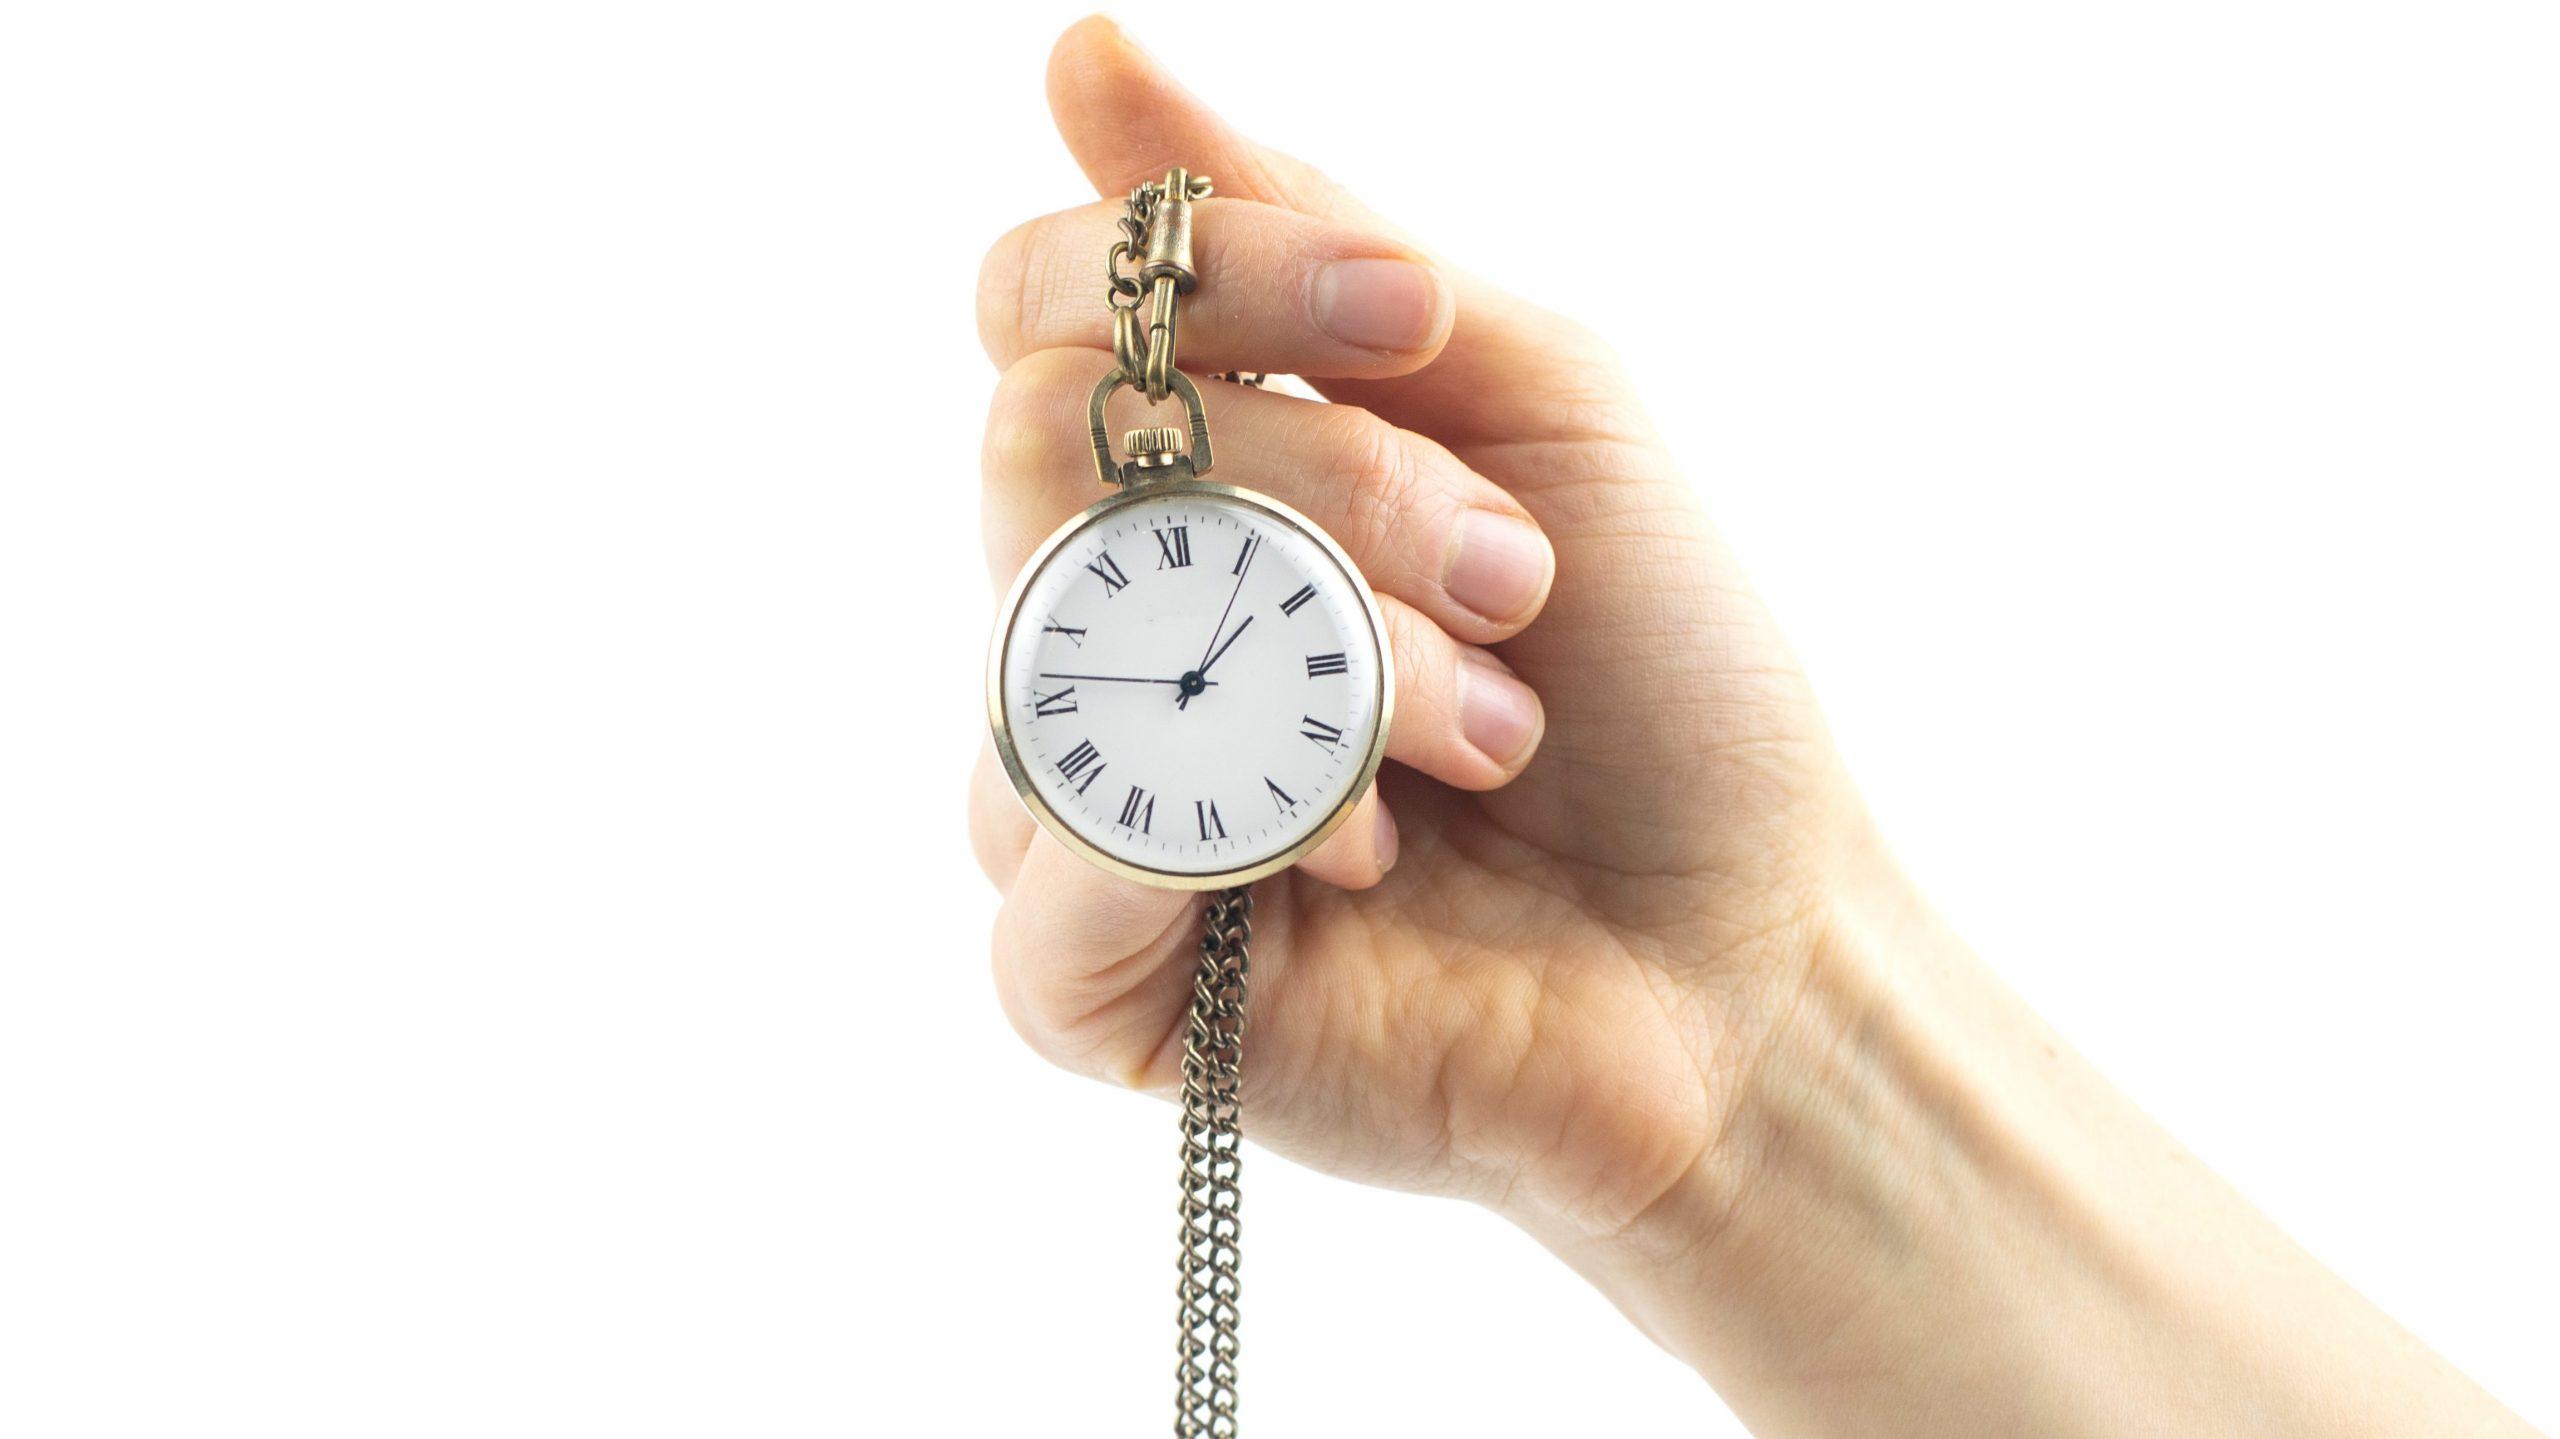 reloj de bolsillo de hombre antiguo